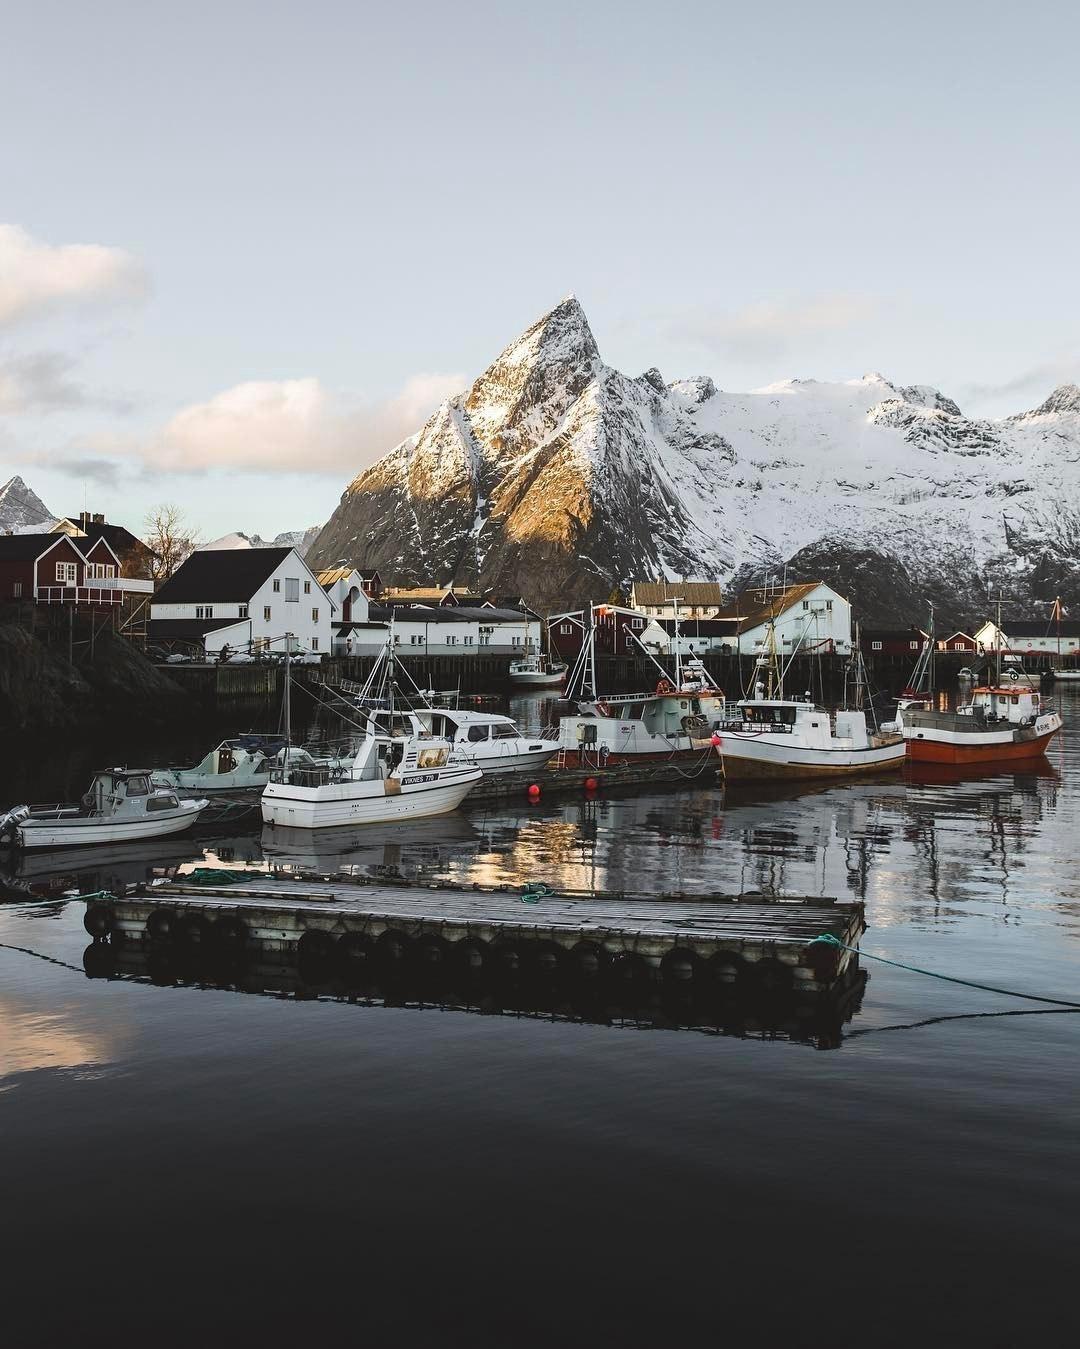 sF02 mb6ZYs - Норвегия - страна холодной красоты